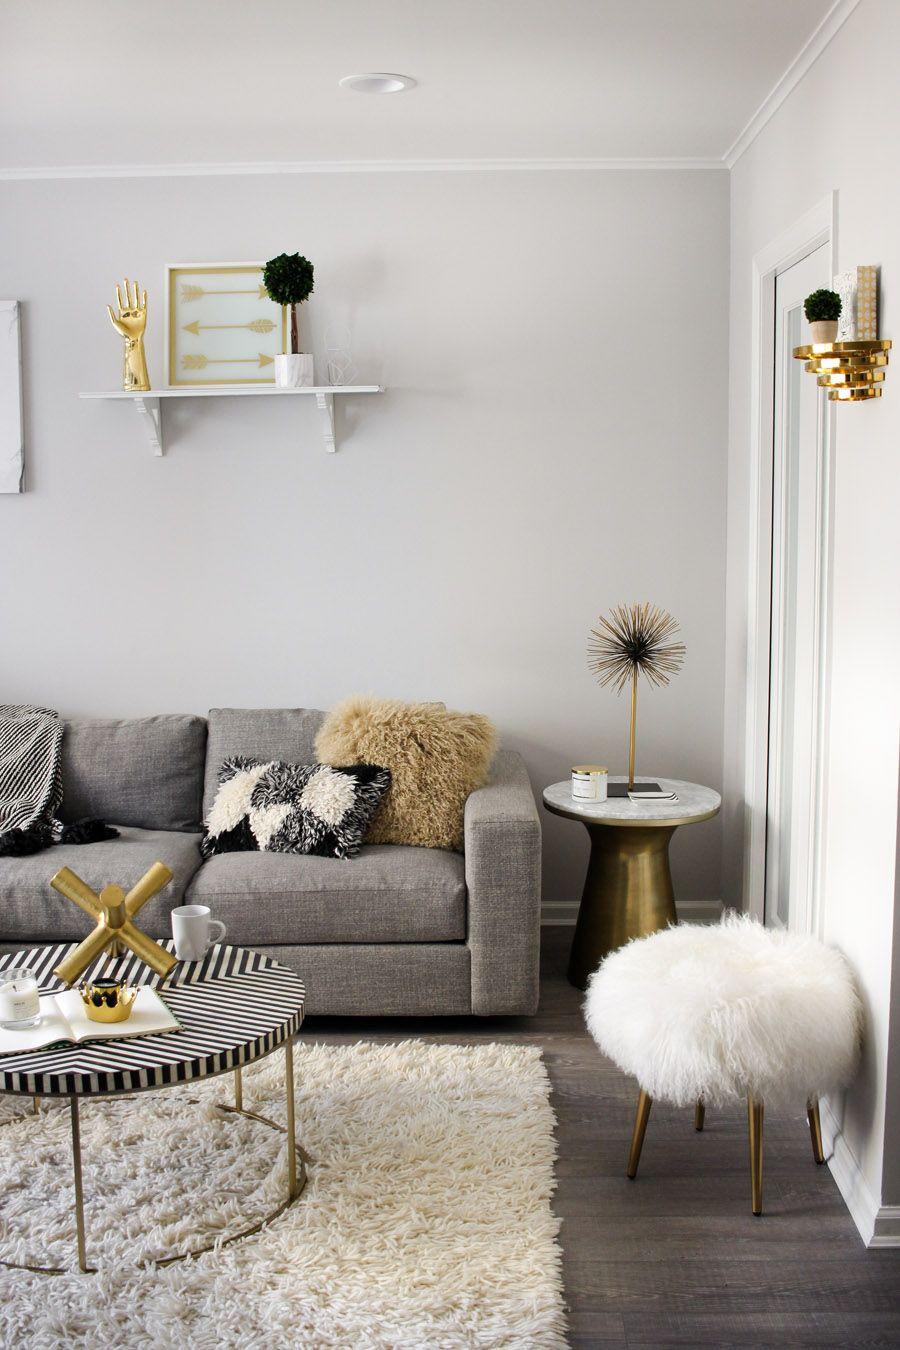 steffy kuncman 39 s monochrome modern living room interiors living room grey living room. Black Bedroom Furniture Sets. Home Design Ideas